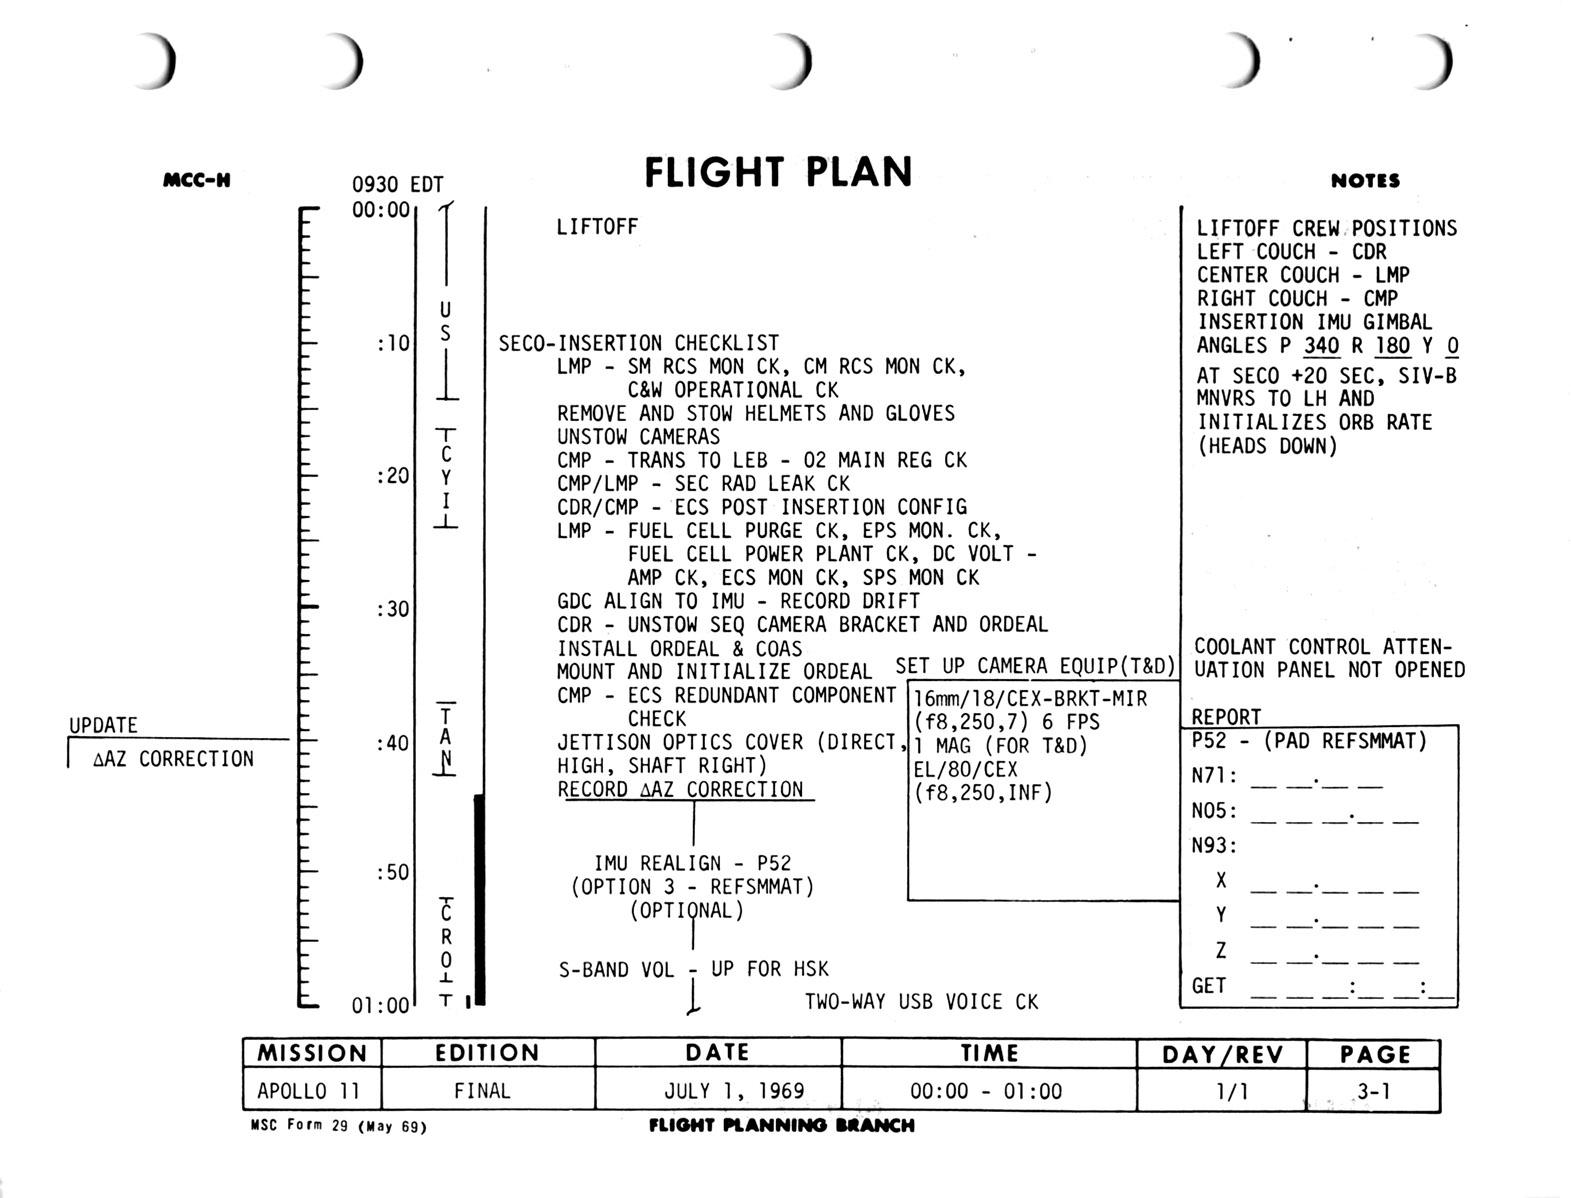 Apollo 11 Flight Journal - Day 1, part 1: Launch